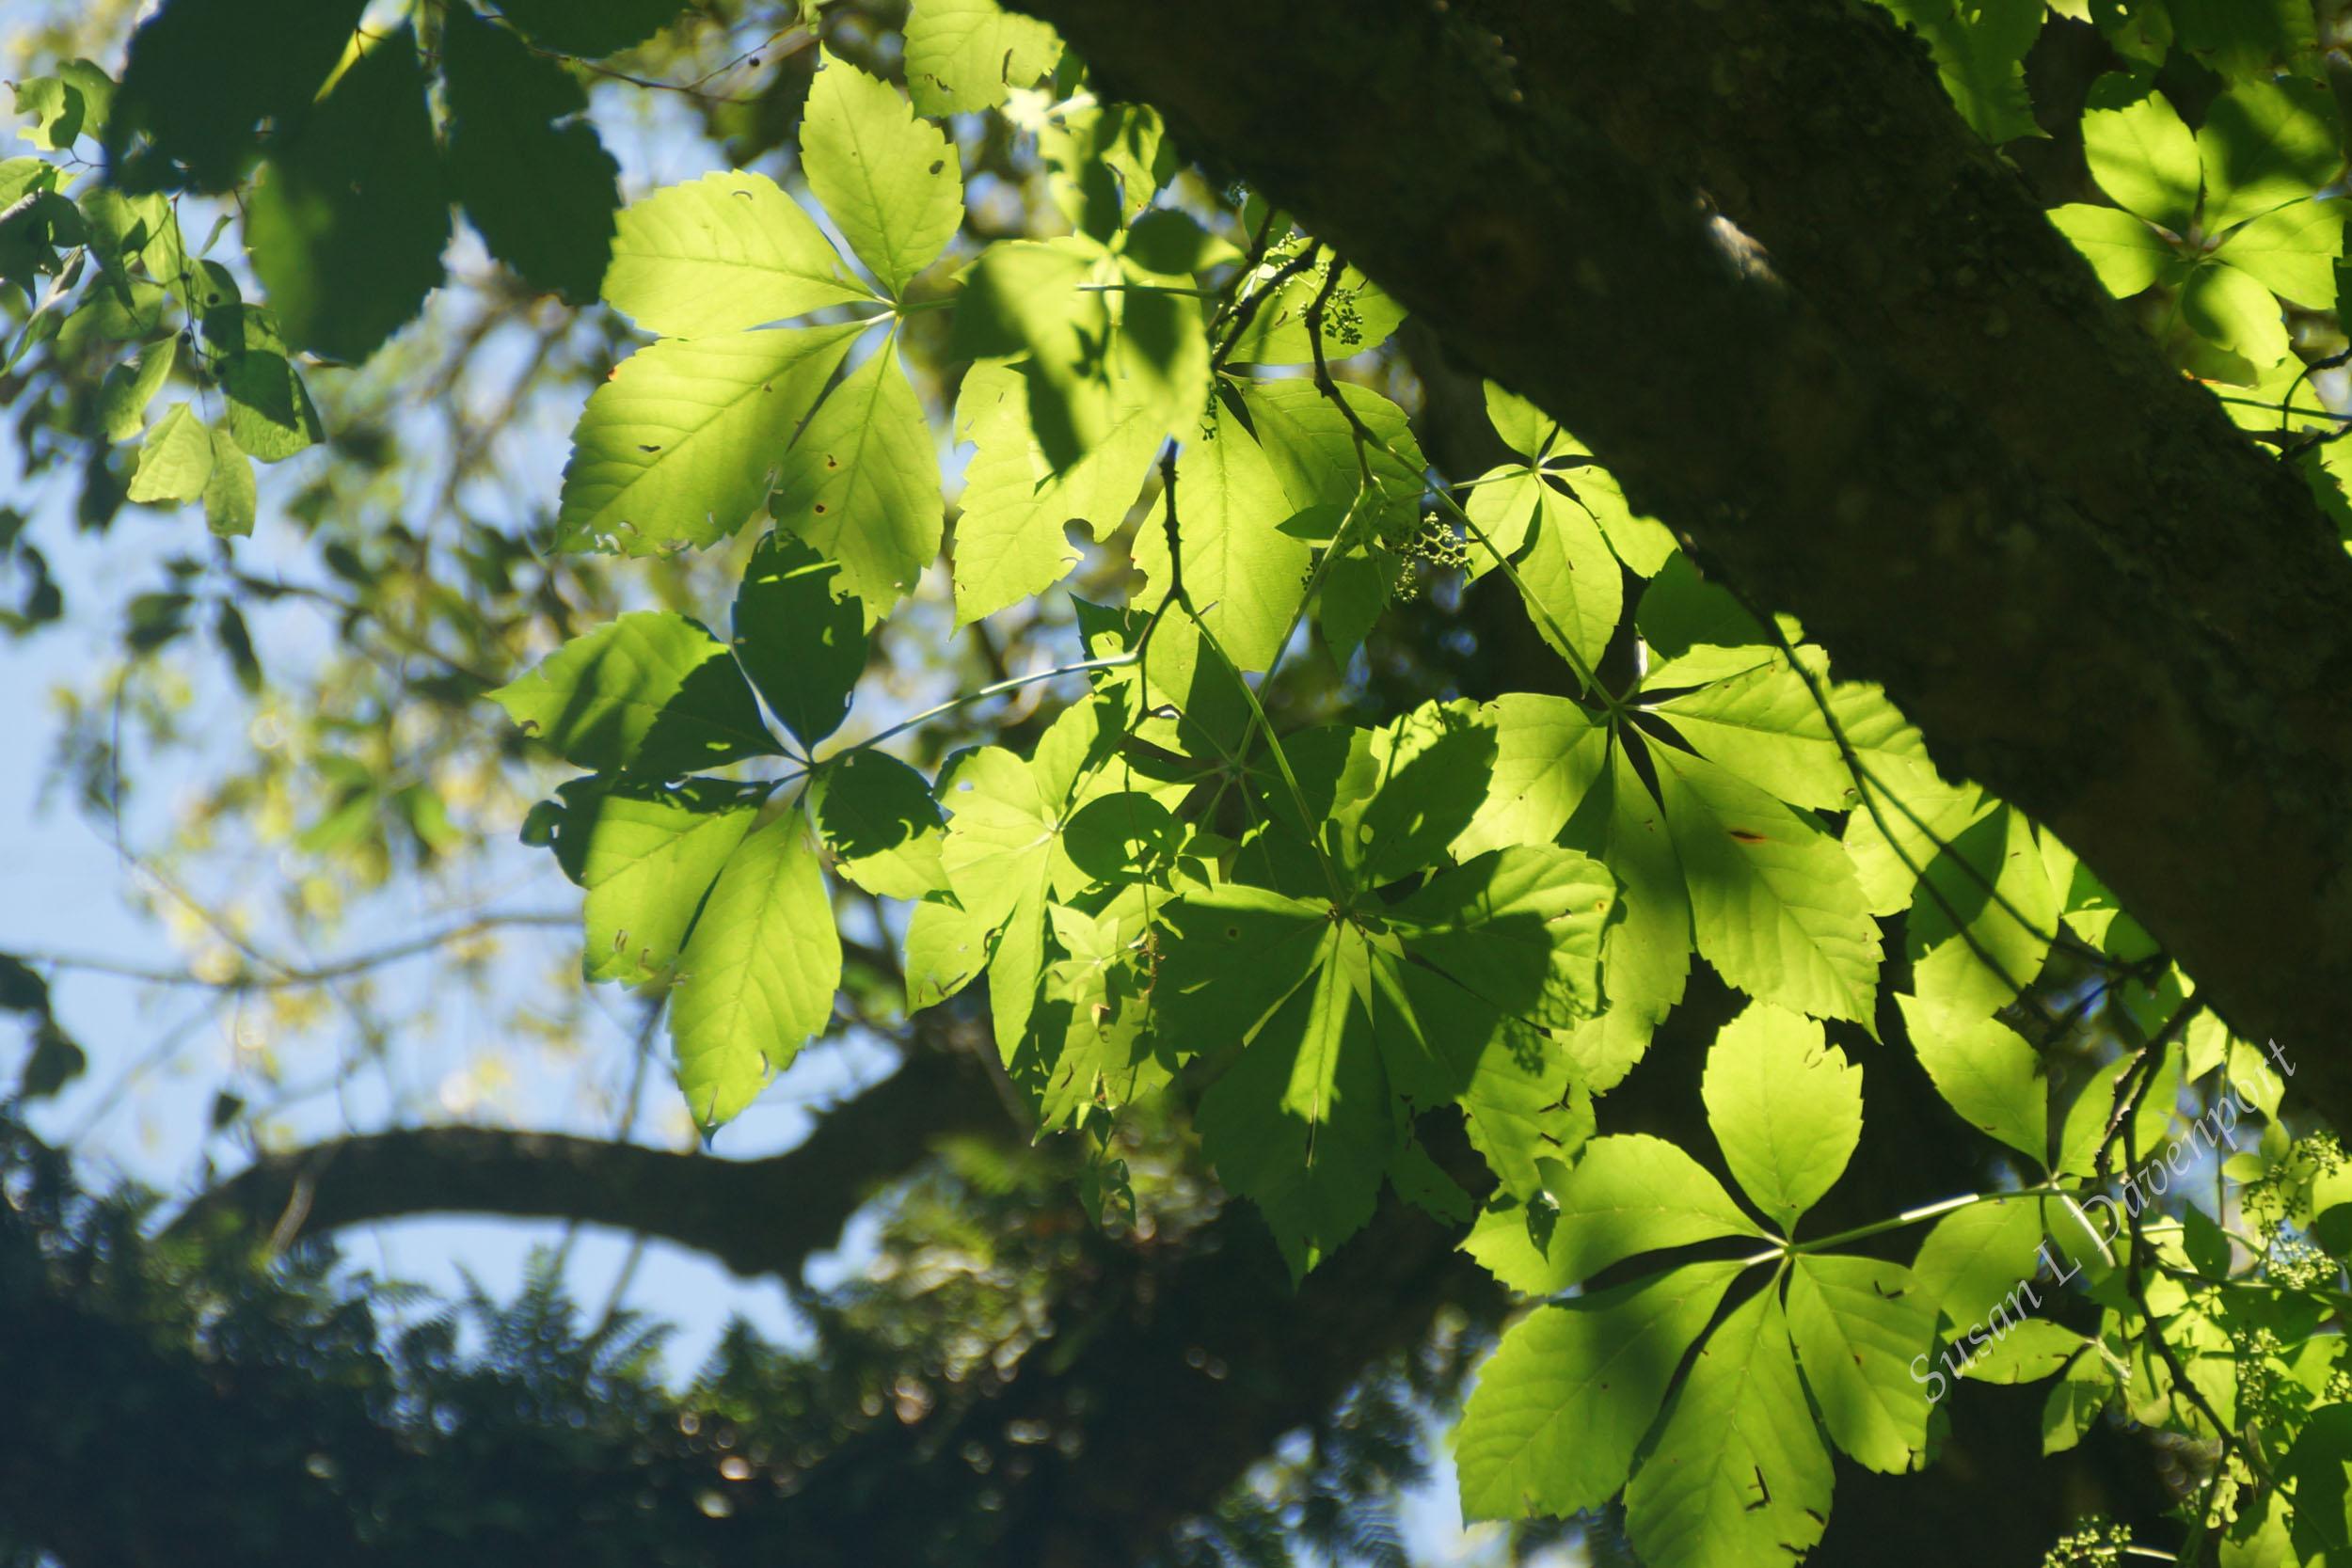 Back-lit Leaves - Photo by Susan L. Davenport